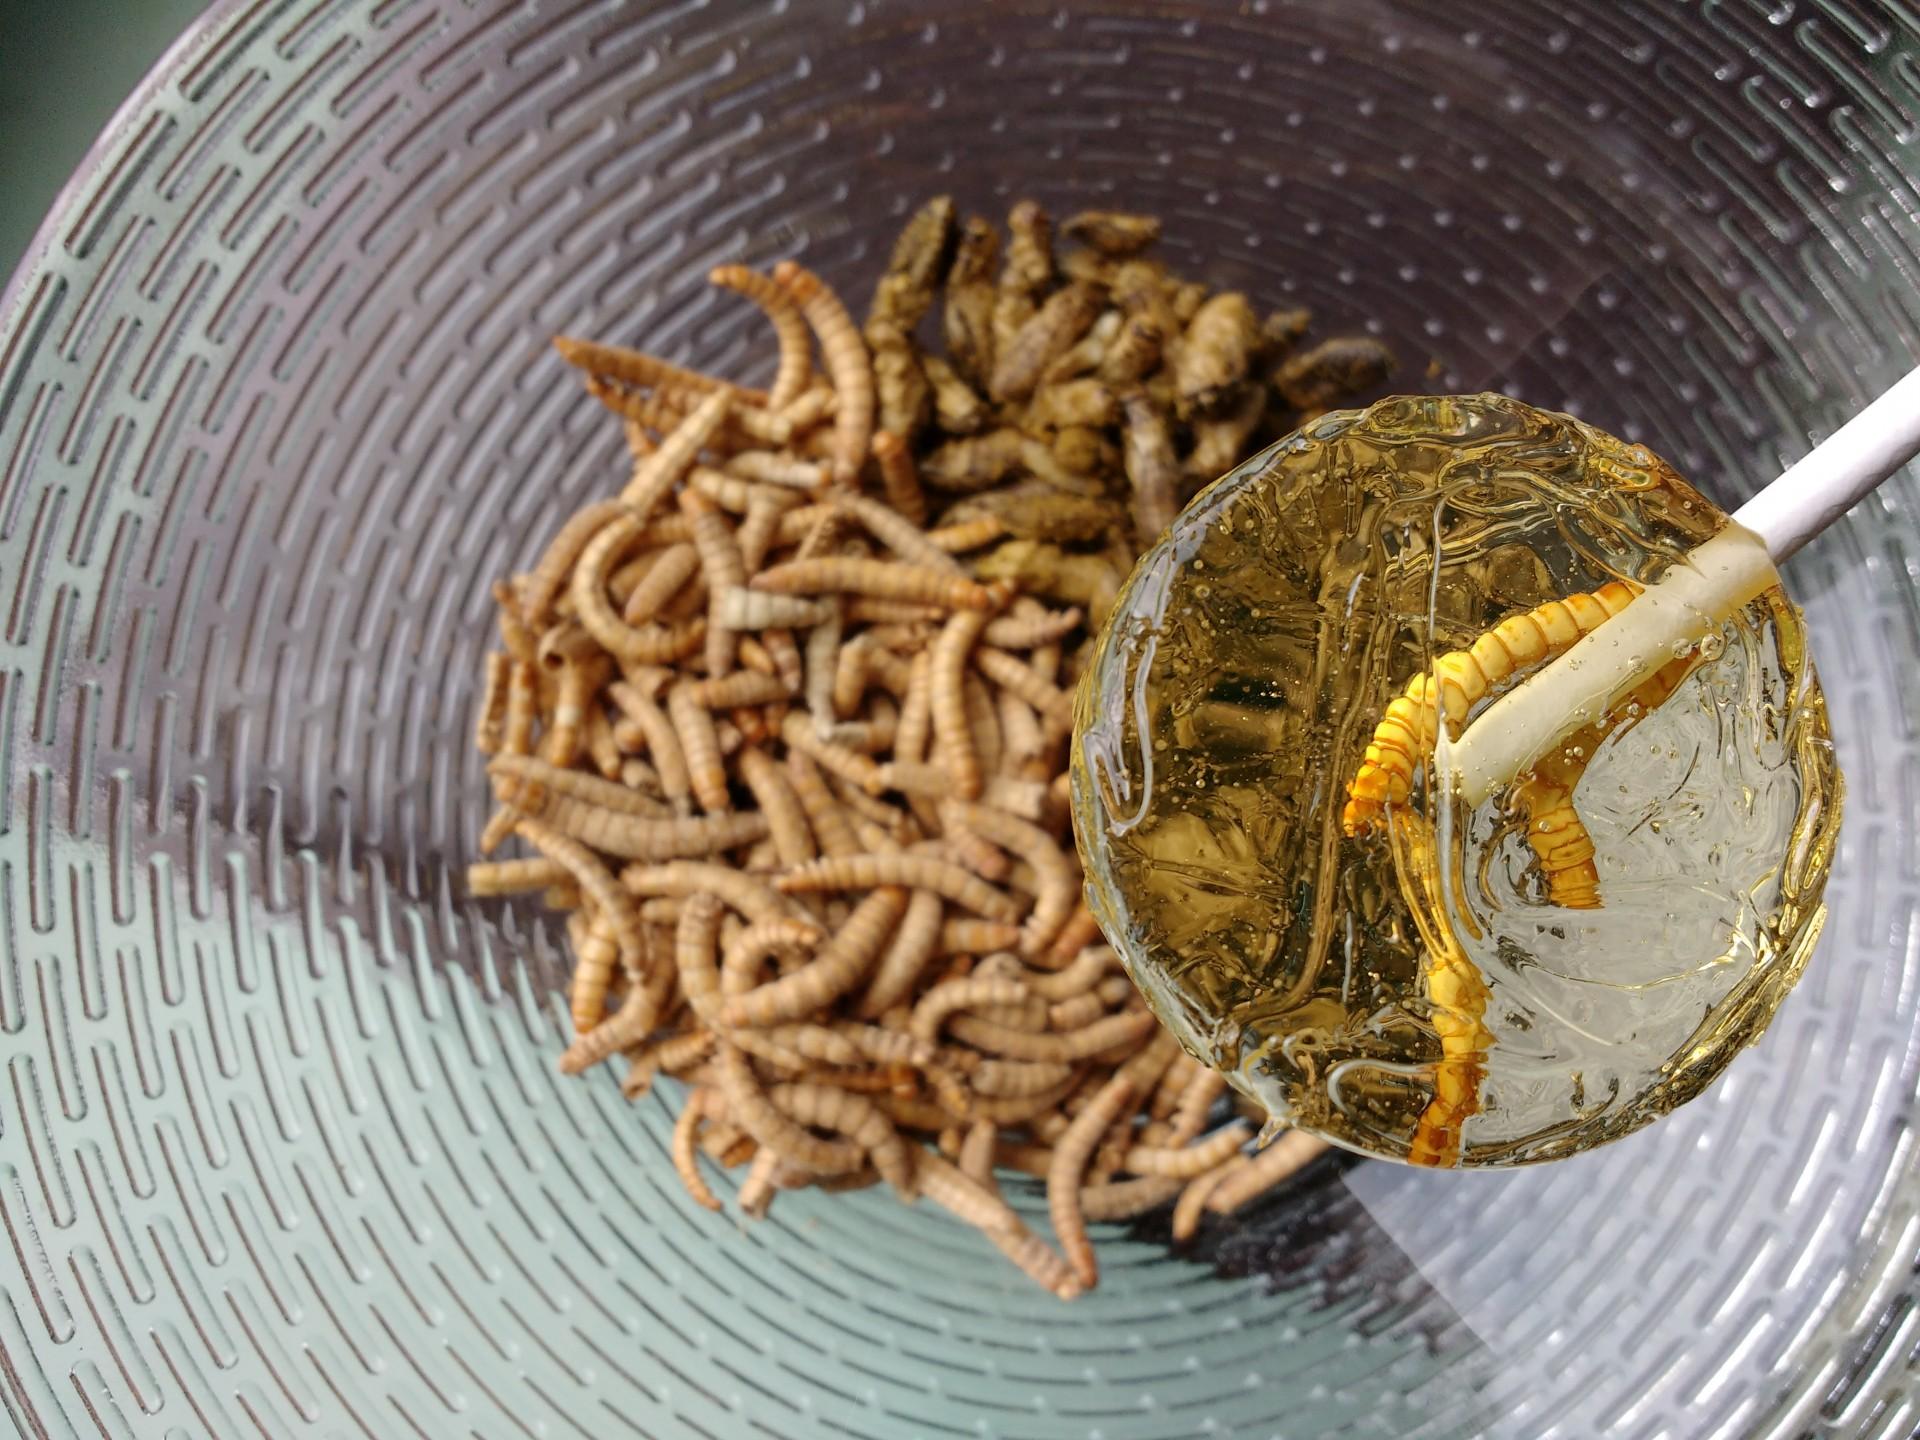 Meelworm cognac lolly en garlic & herb buffalowormen